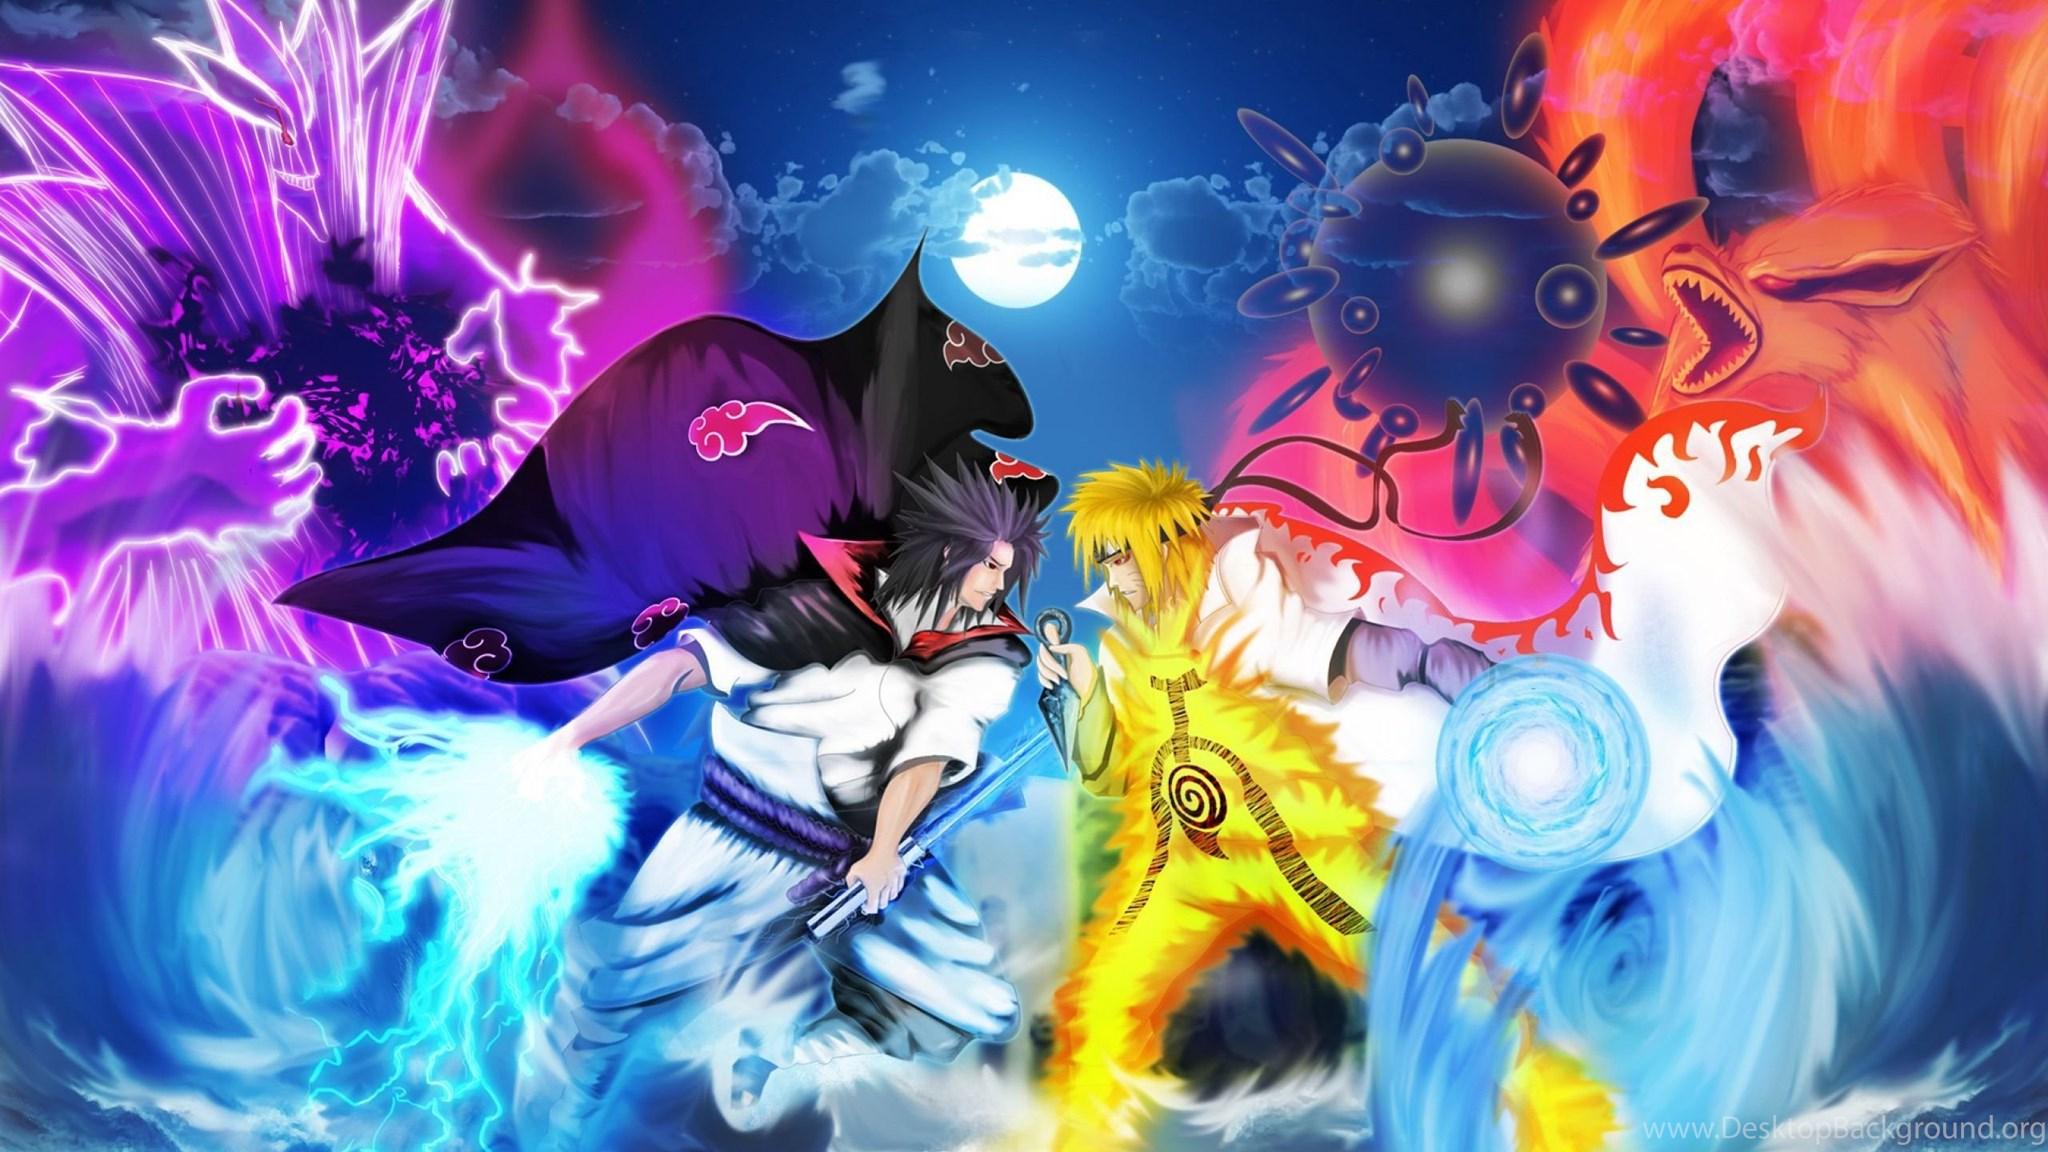 Naruto Vs Sasuke Wallpapers Free Desktop Background